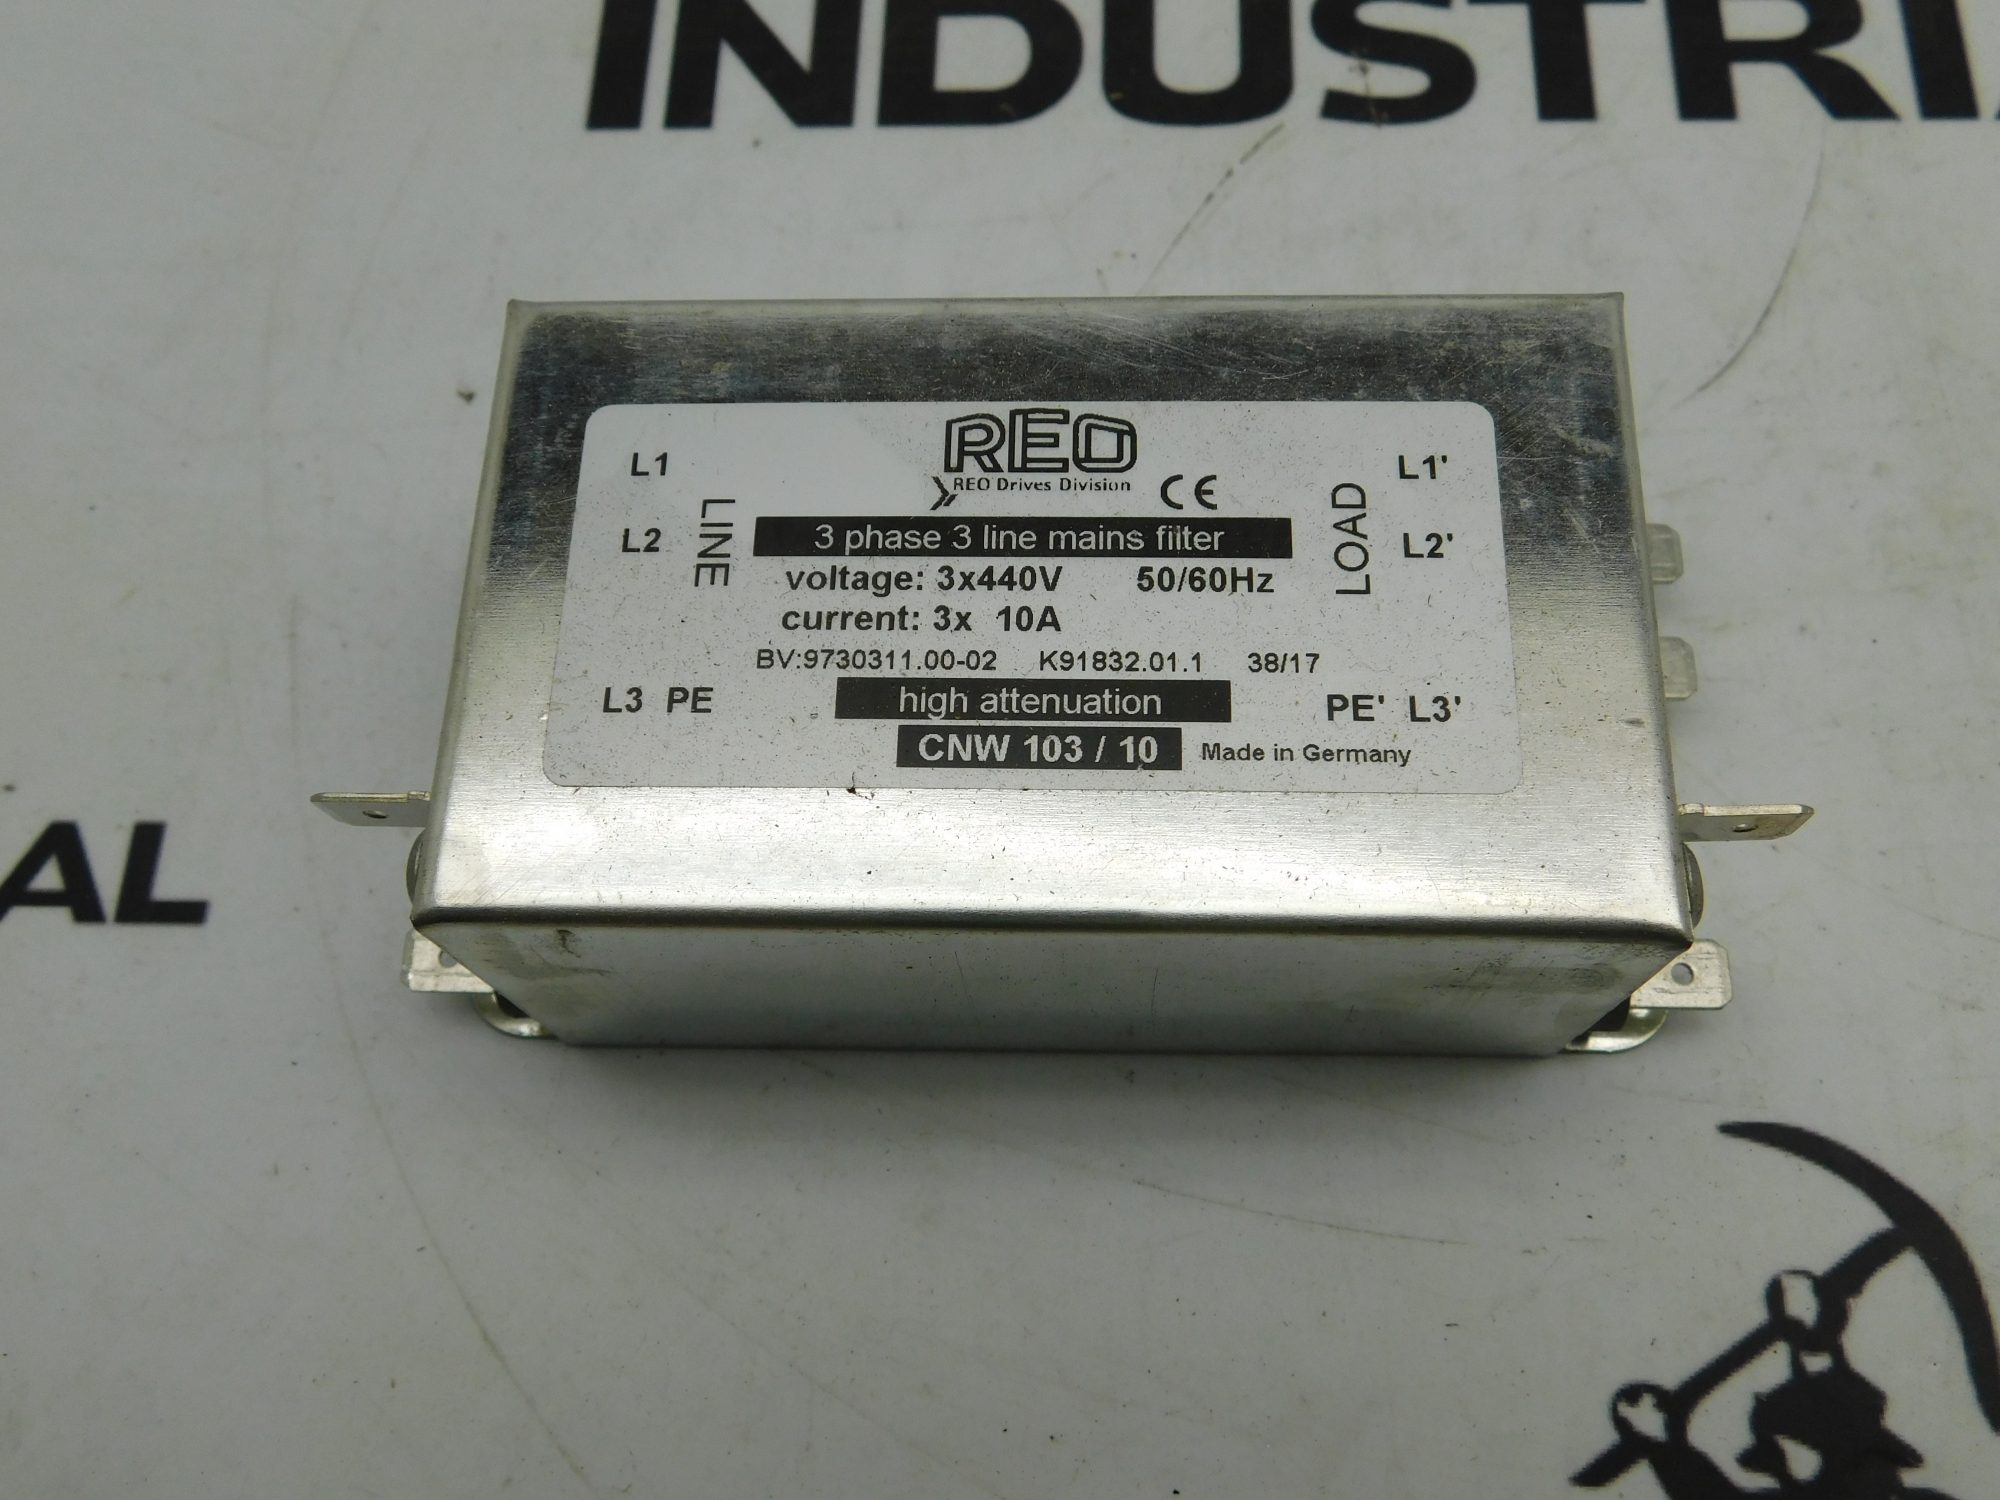 REO CNW 103/10 3x440V 3x10A 50/60Hz 3 Phase Line Filter